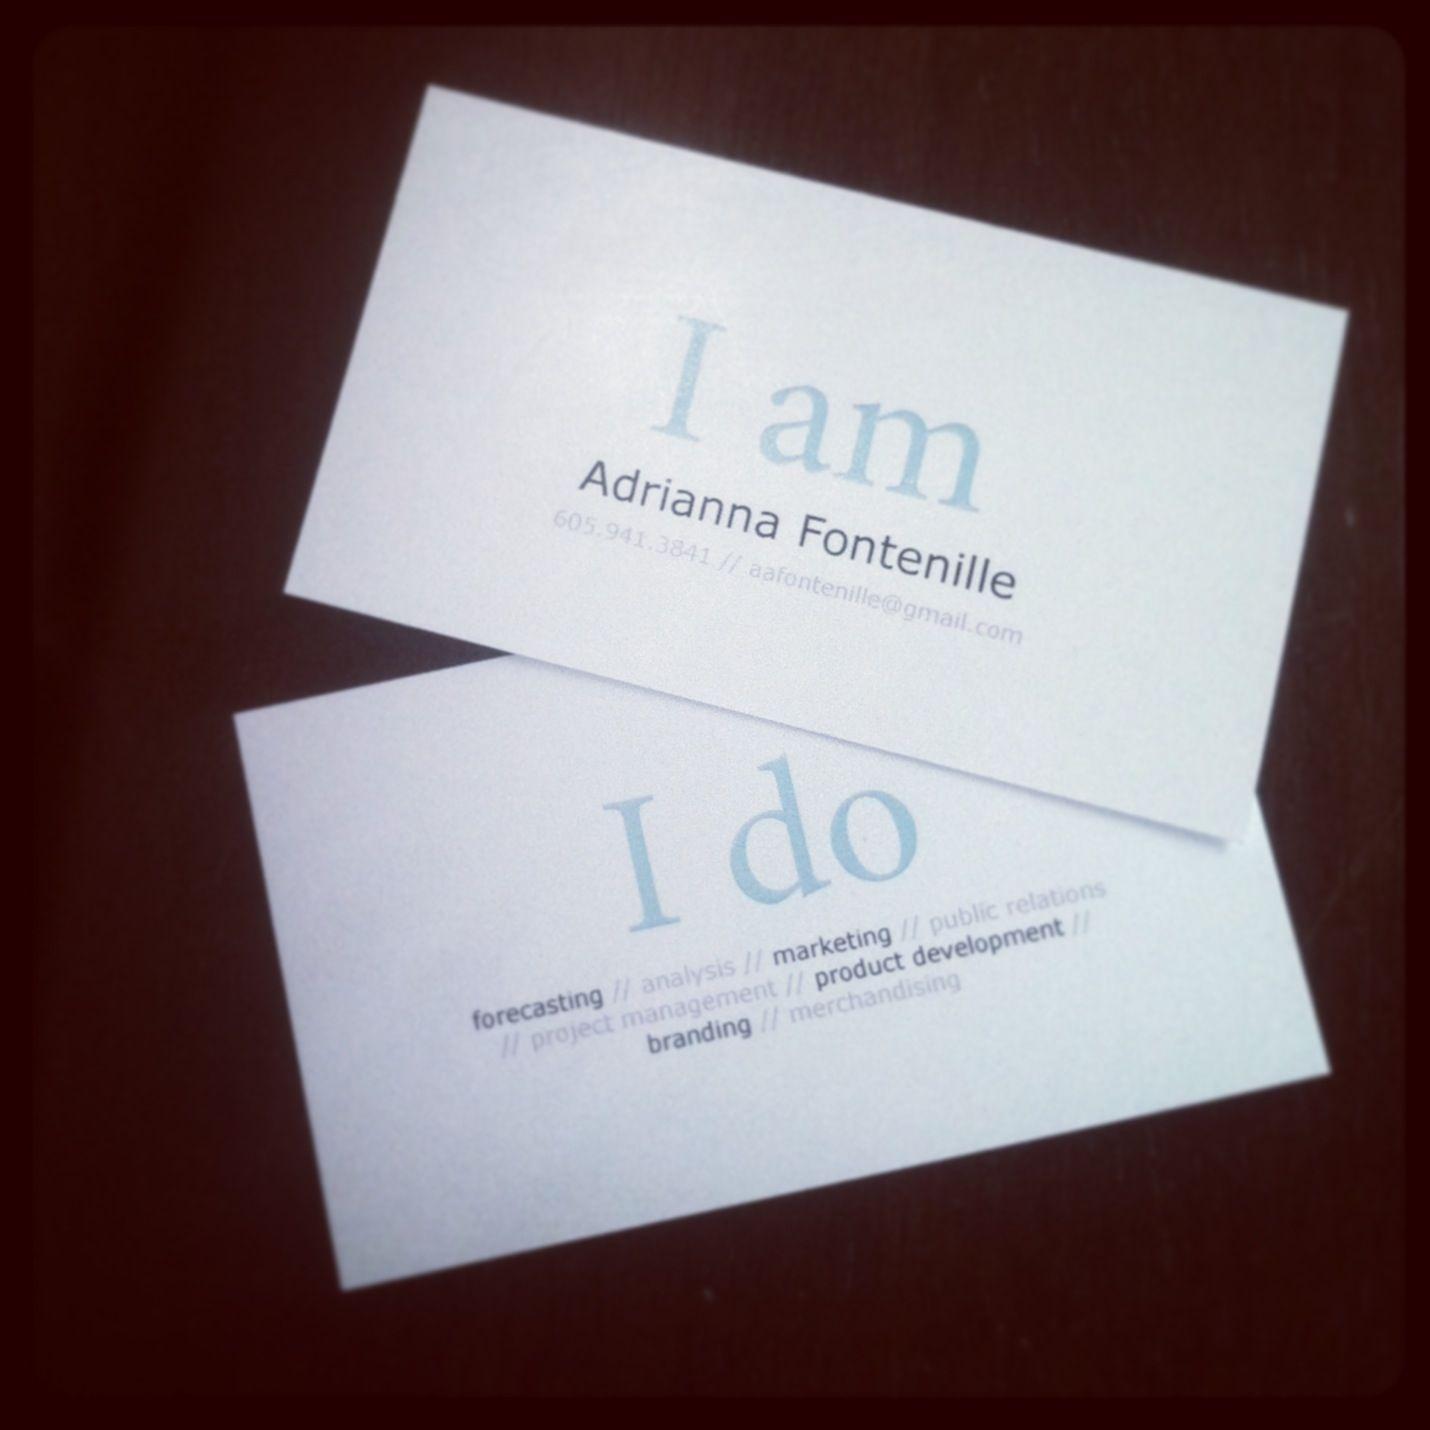 Feminine business cards | (not boring) business card | Pinterest ...